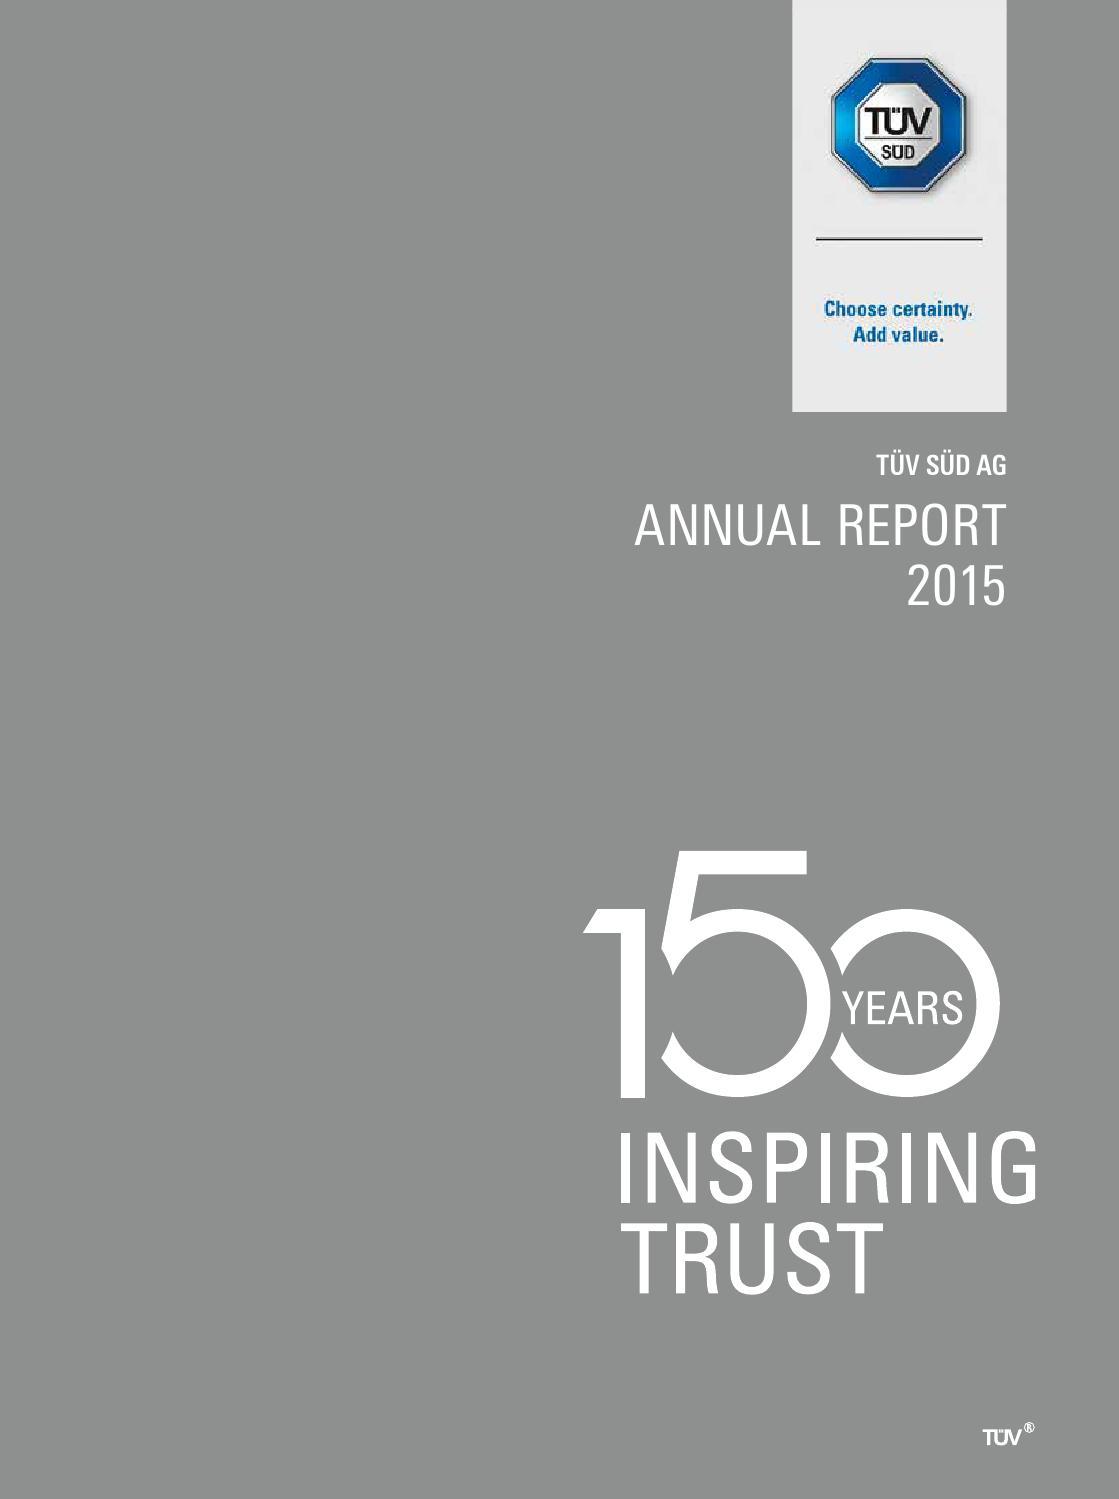 t v s d annual report 2015 by t v s d issuu. Black Bedroom Furniture Sets. Home Design Ideas